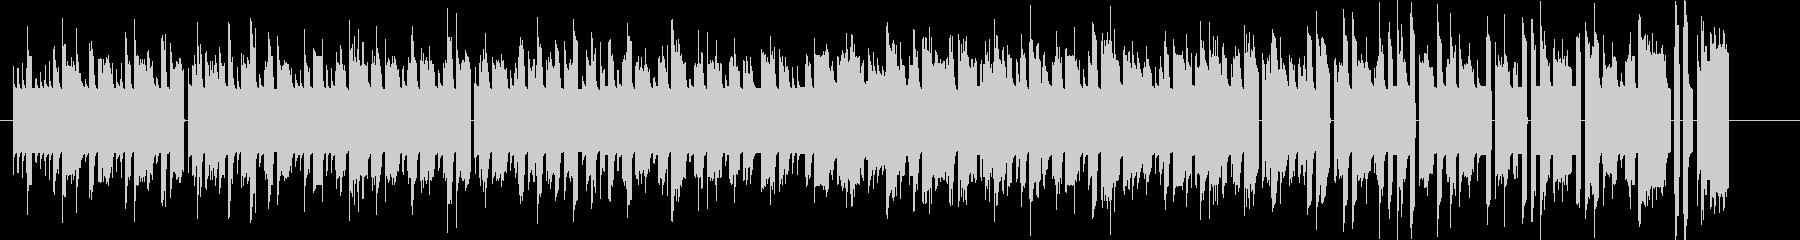 Bitシンセによる暖かなファミコンBGMの未再生の波形